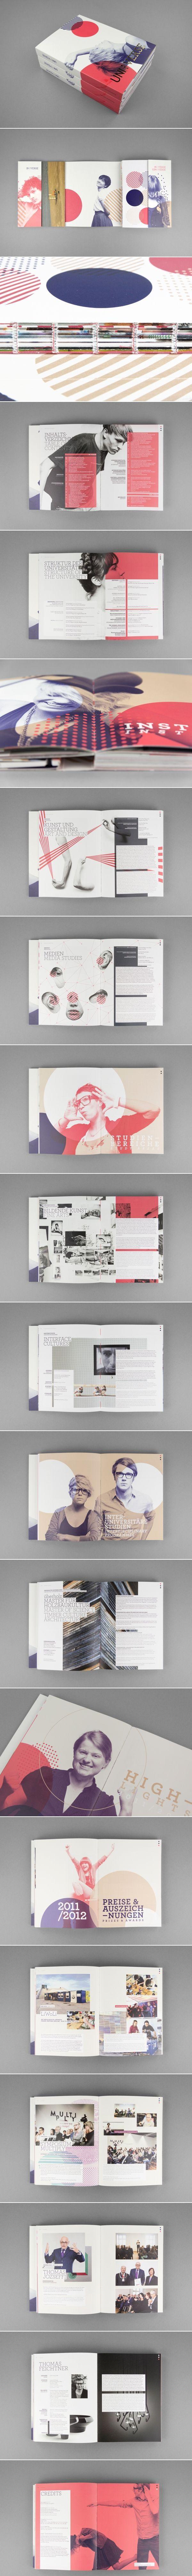 Image-Publication for the Art University of Linz Design: MOOI design Photography: Helga Traxler, Florian Voggeneder